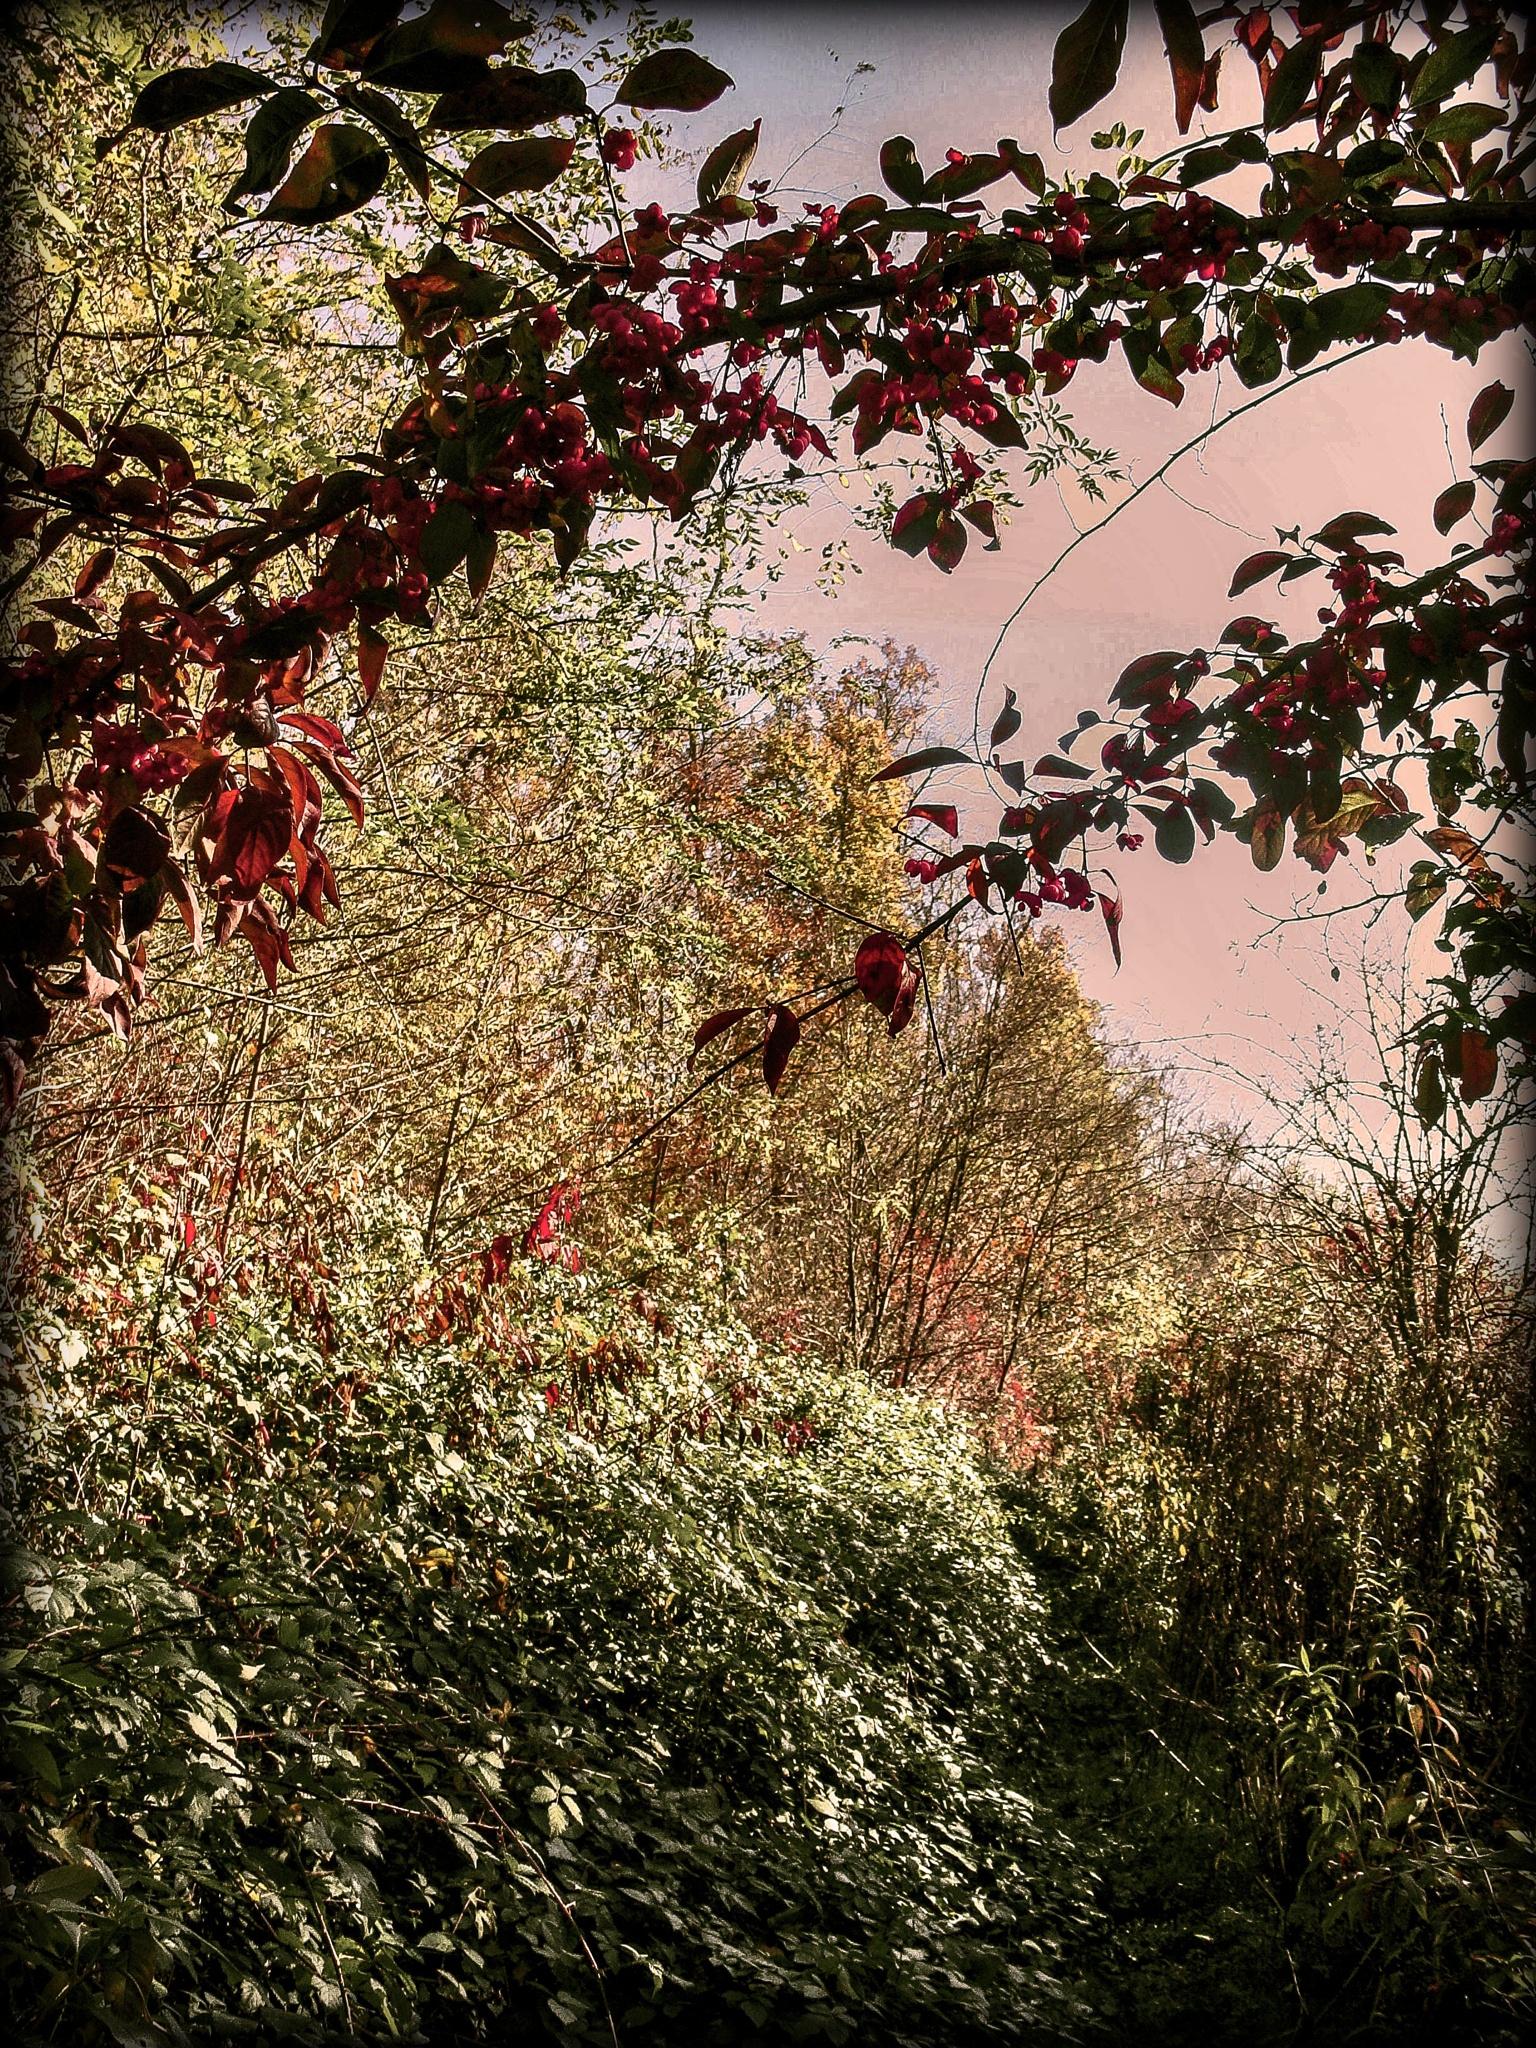 trees and bushes by Cesare Vatrano